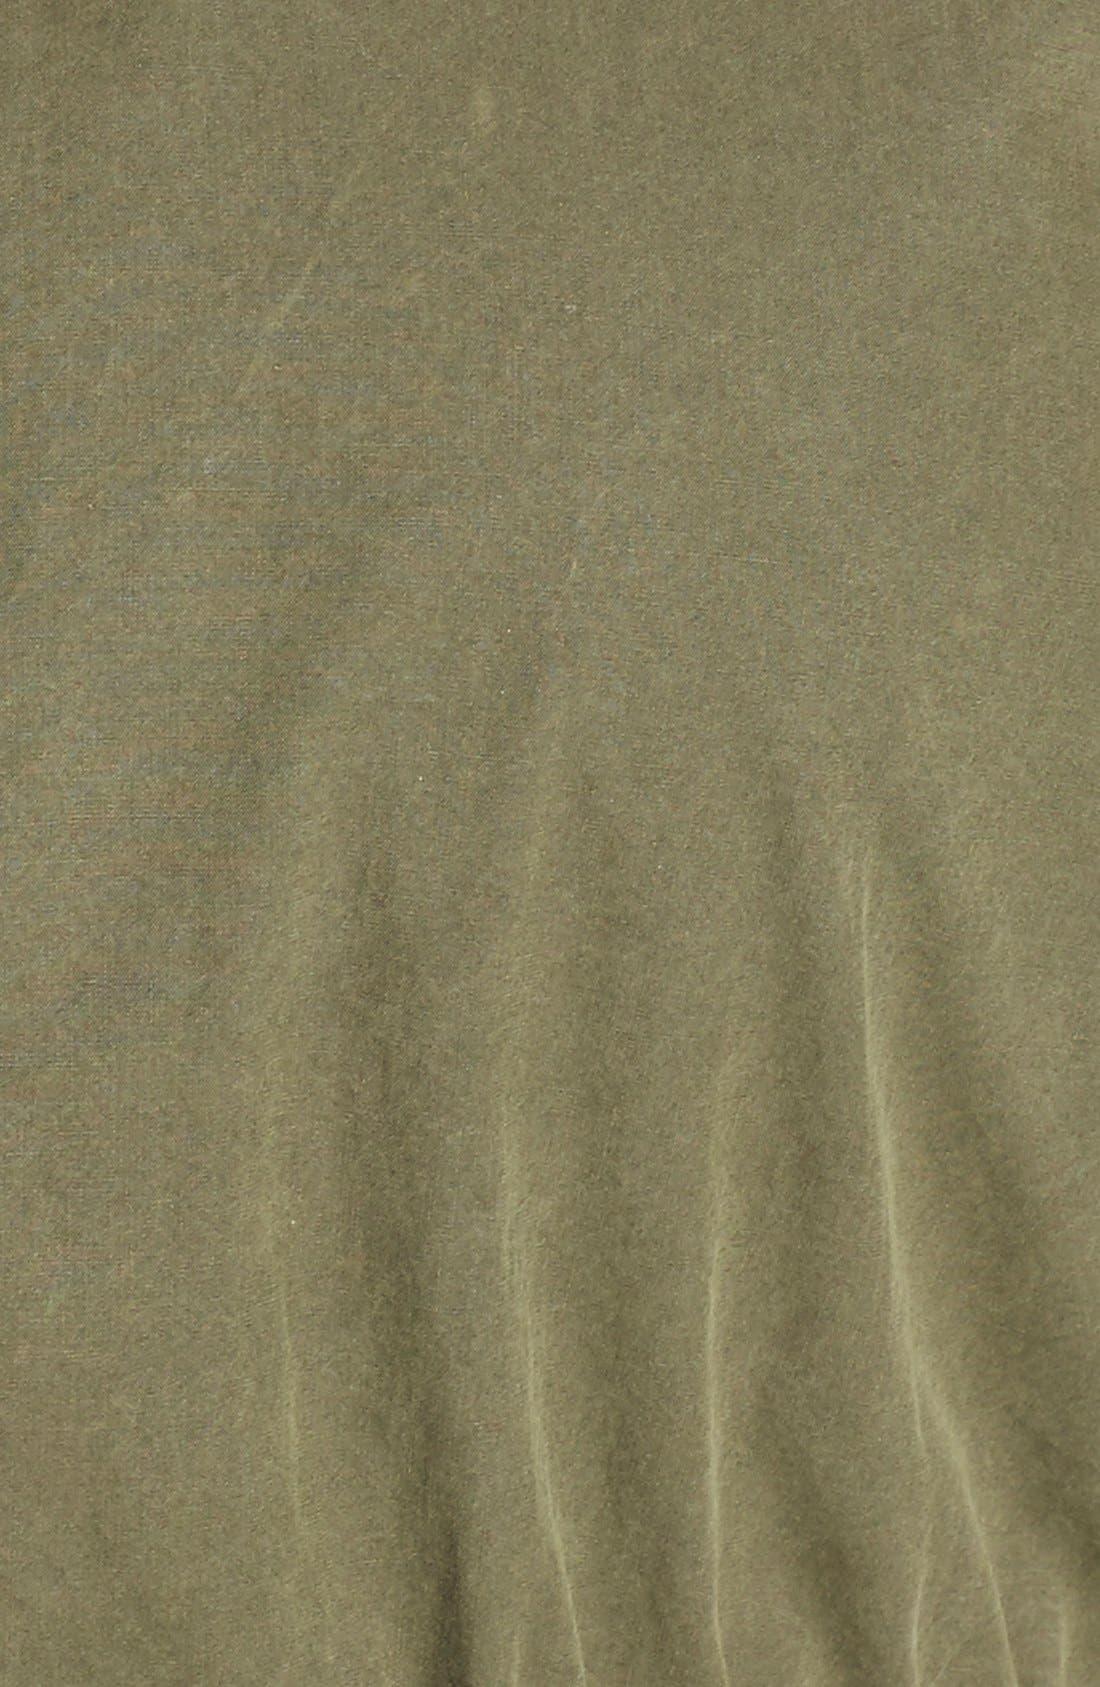 Parachute Hooded Cotton Utility Jacket,                             Alternate thumbnail 15, color,